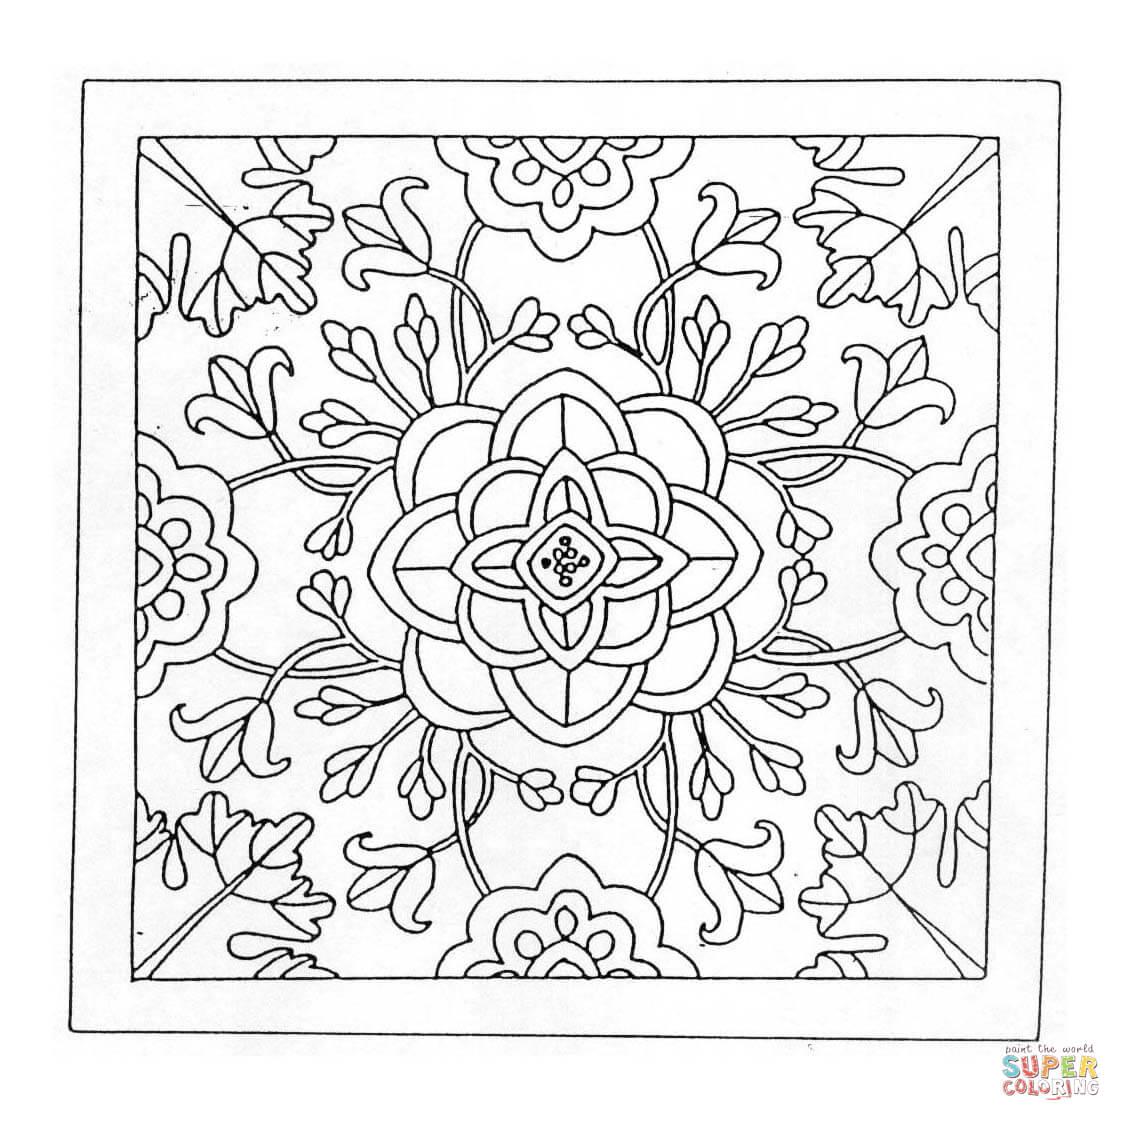 Kleurplaat Van Volwasen Dieren 57 Dessins De Coloriage Mandalas Fleurs 224 Imprimer Sur